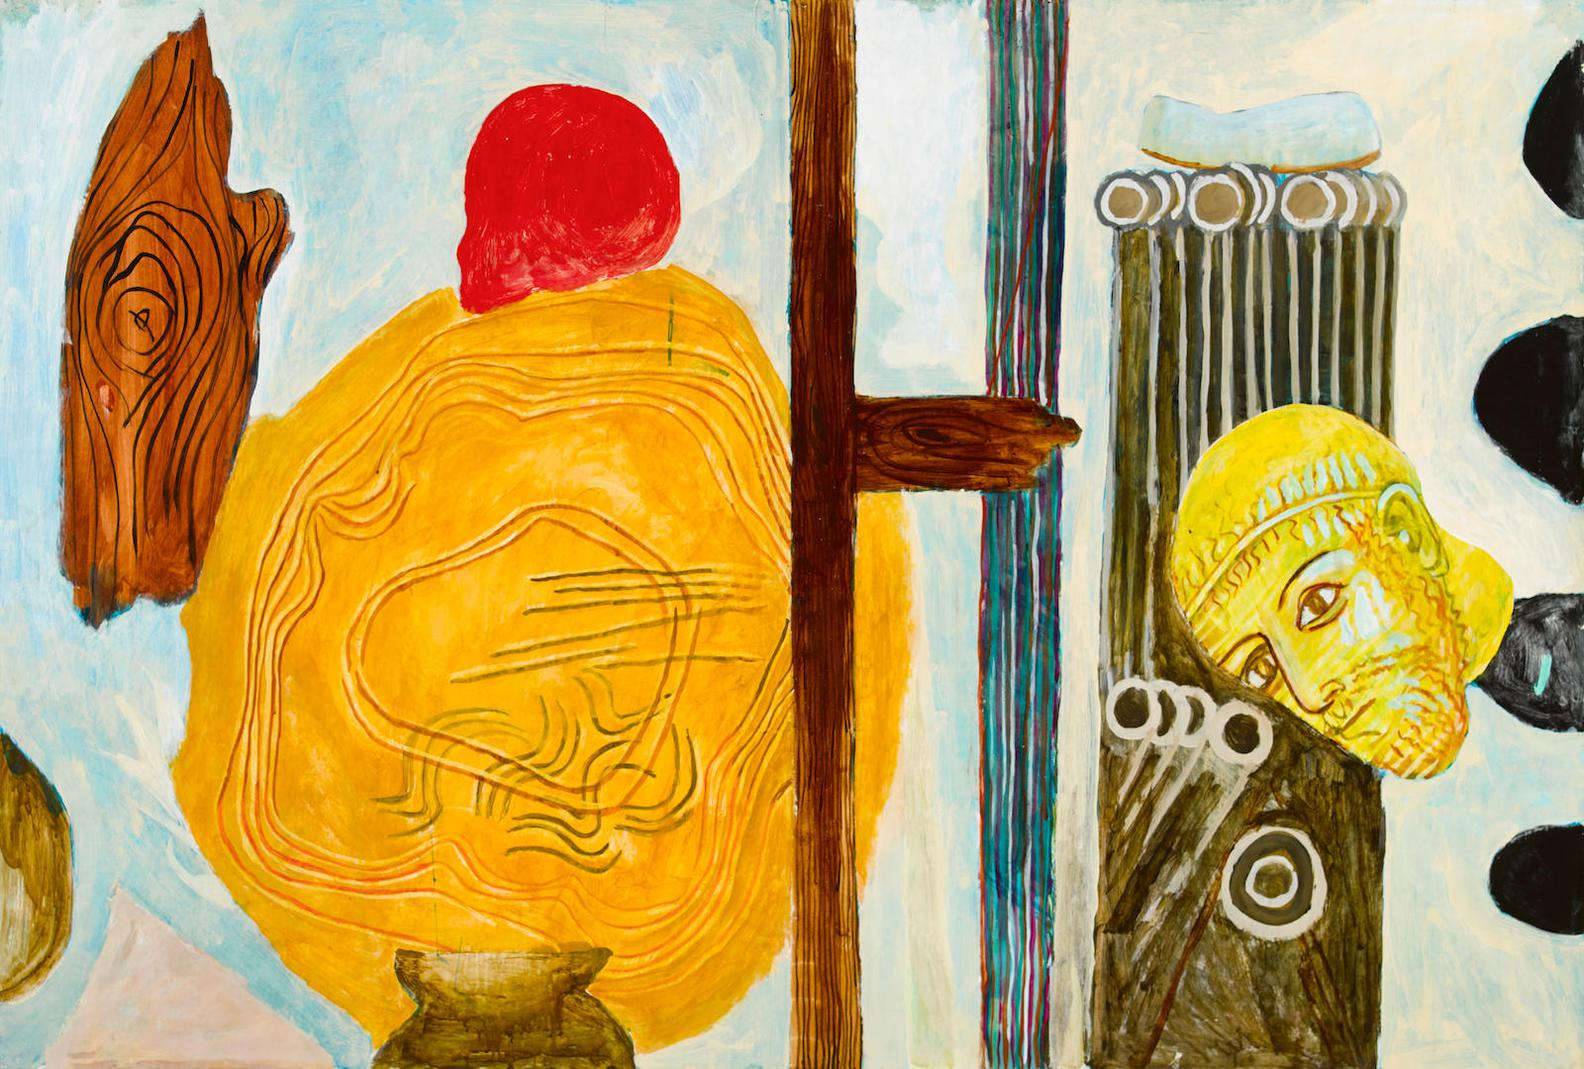 Charles Garabedian - Untitled (Red Skull)-1981